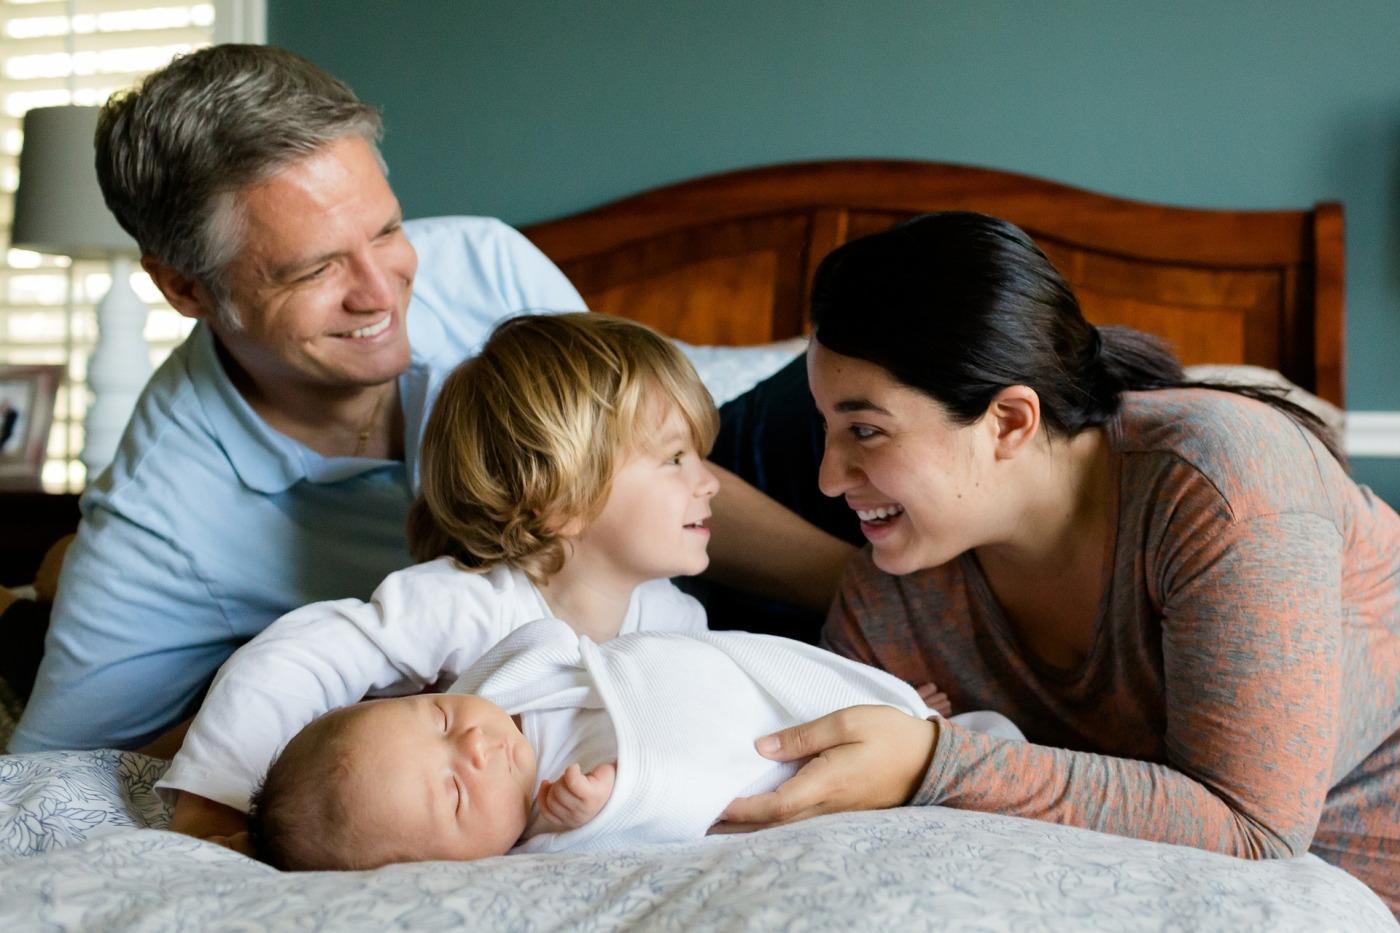 family children voluntaryist voluntaryism